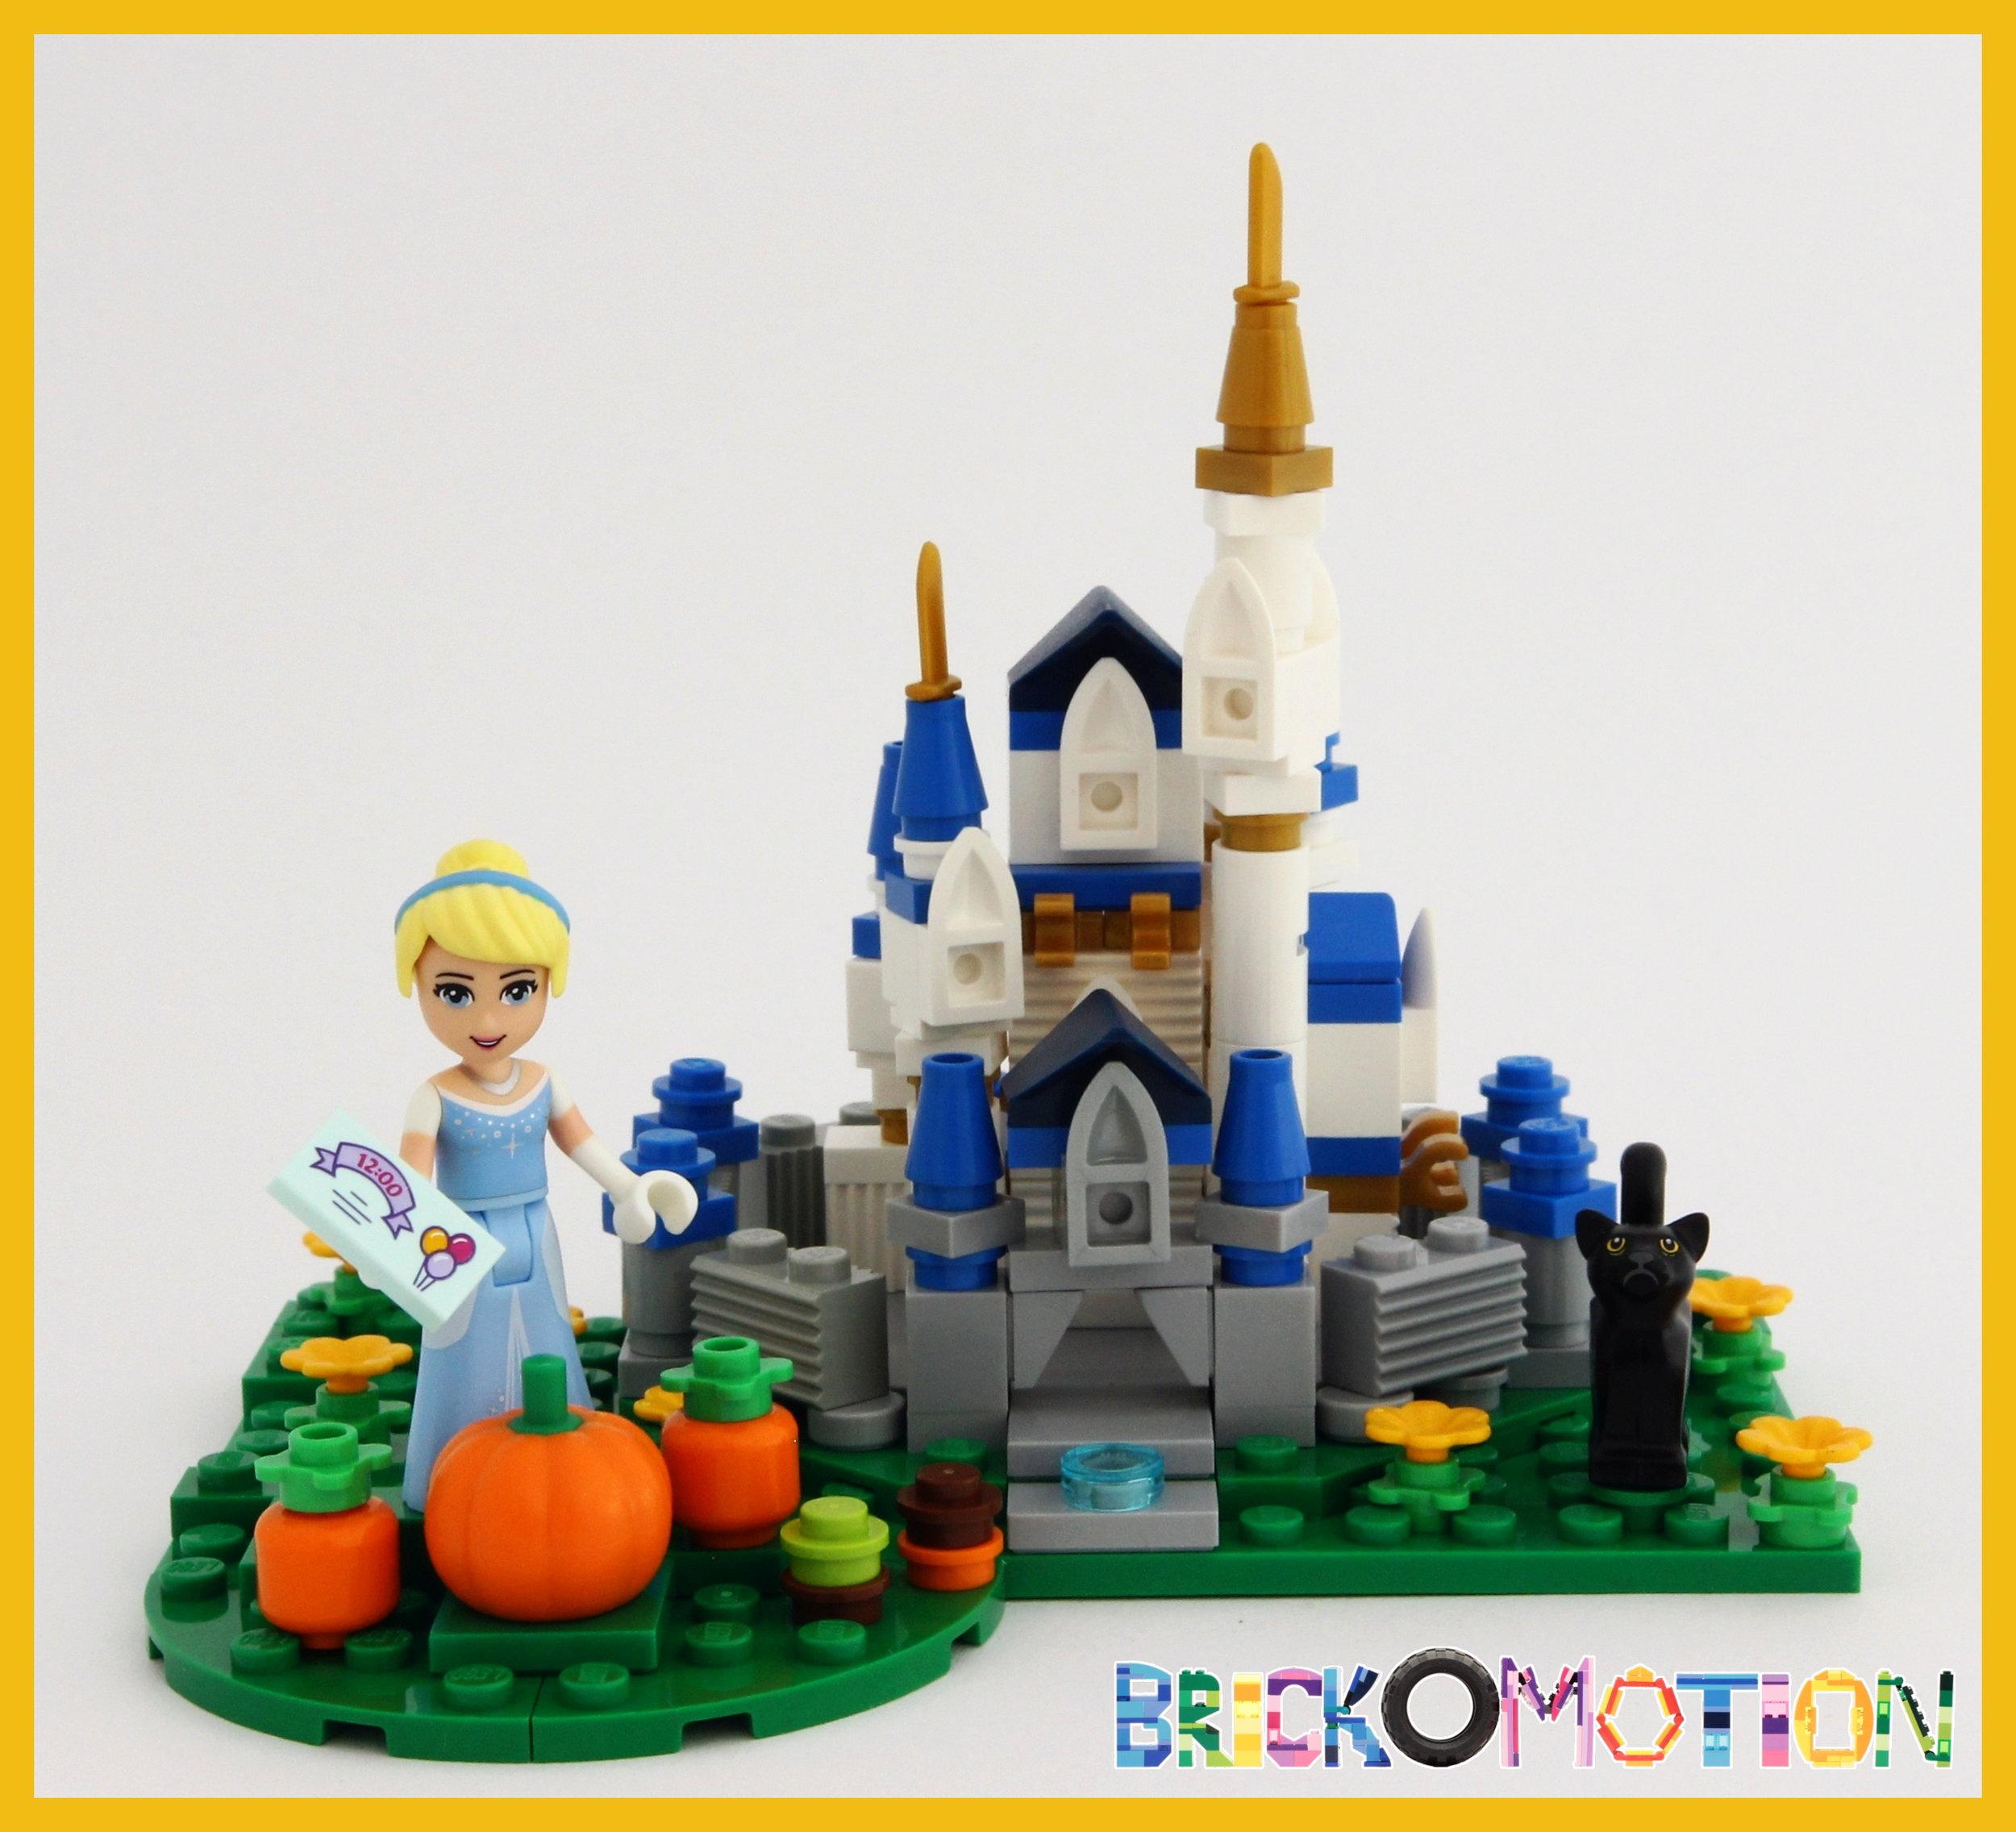 Cinderella's microcastle